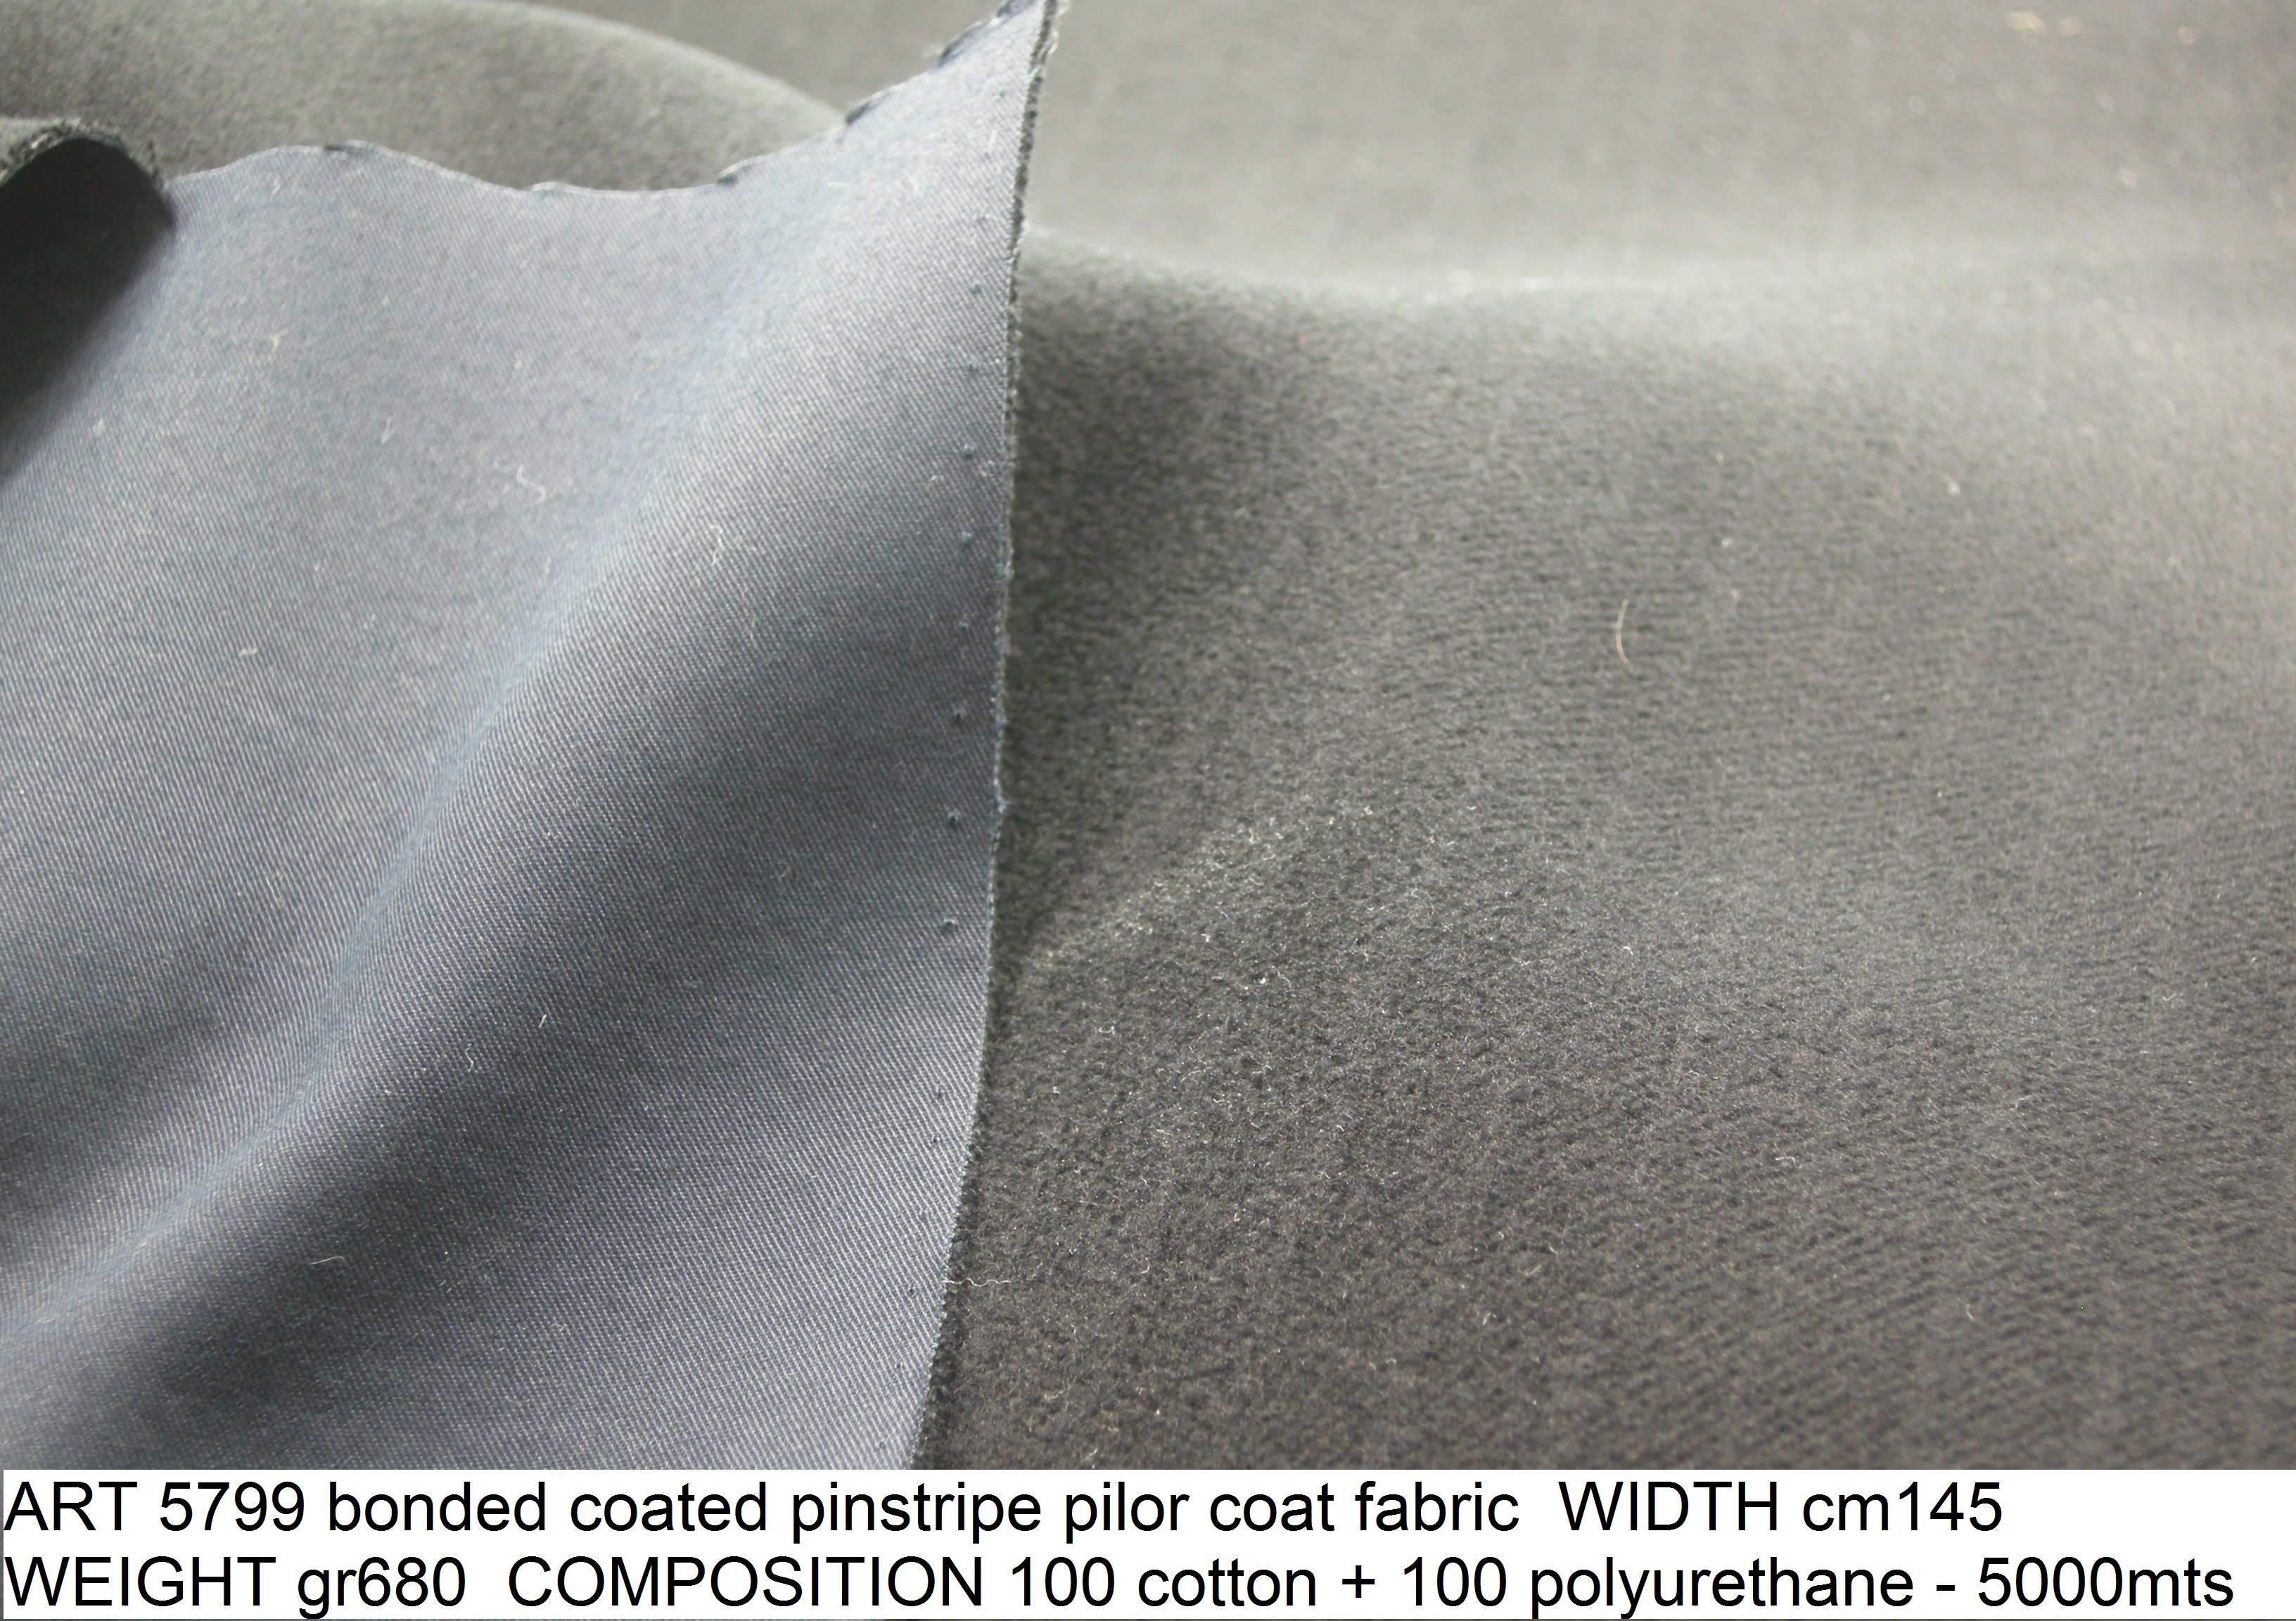 ART 5799 bonded coated pinstripe pilor coat fabric WIDTH cm145 WEIGHT gr680 COMPOSITION 100 cotton 100 polyurethane - 5000mts